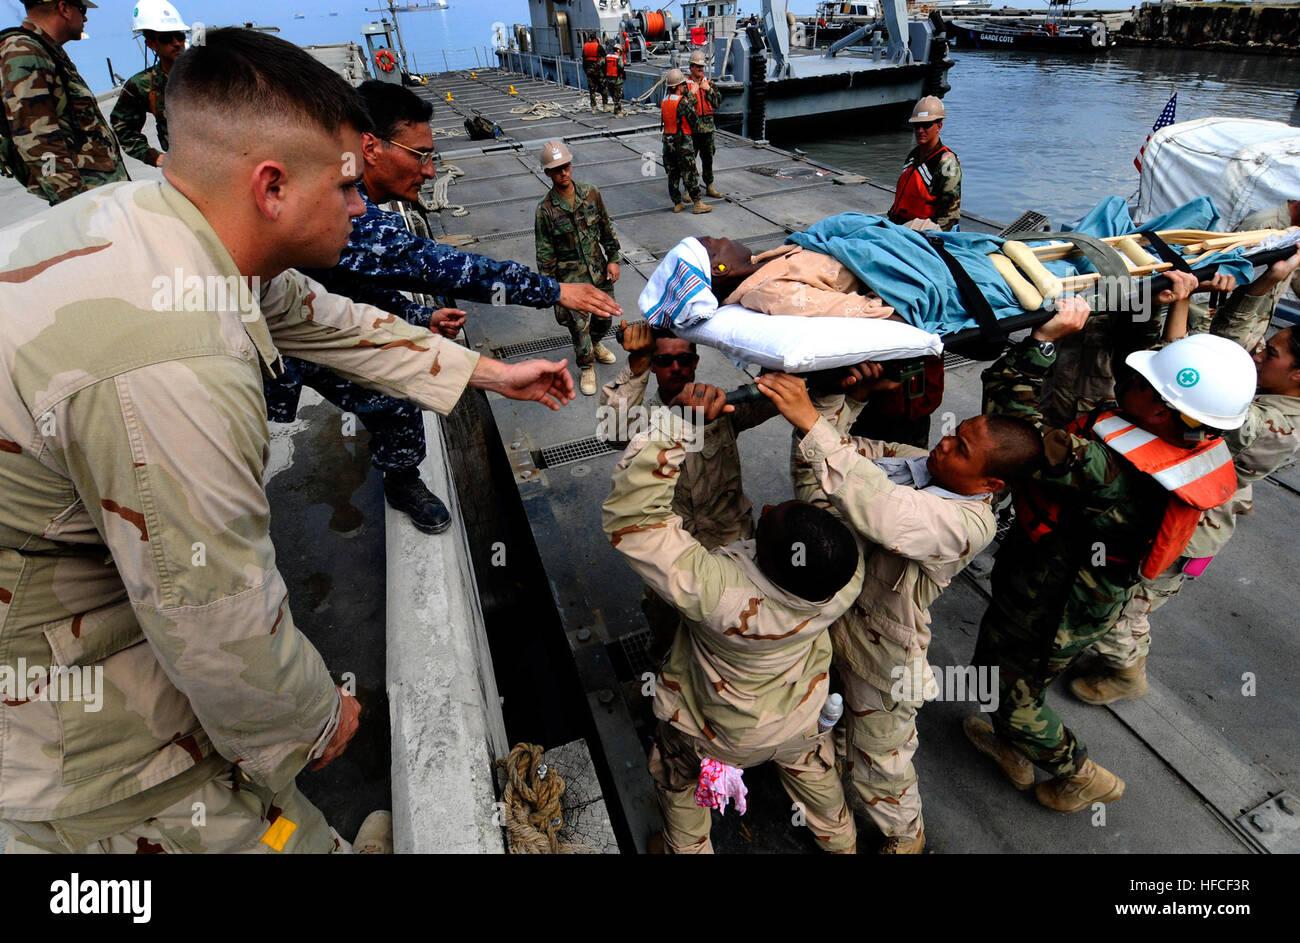 Military Stretcher Stockfotos & Military Stretcher Bilder - Seite 2 ...